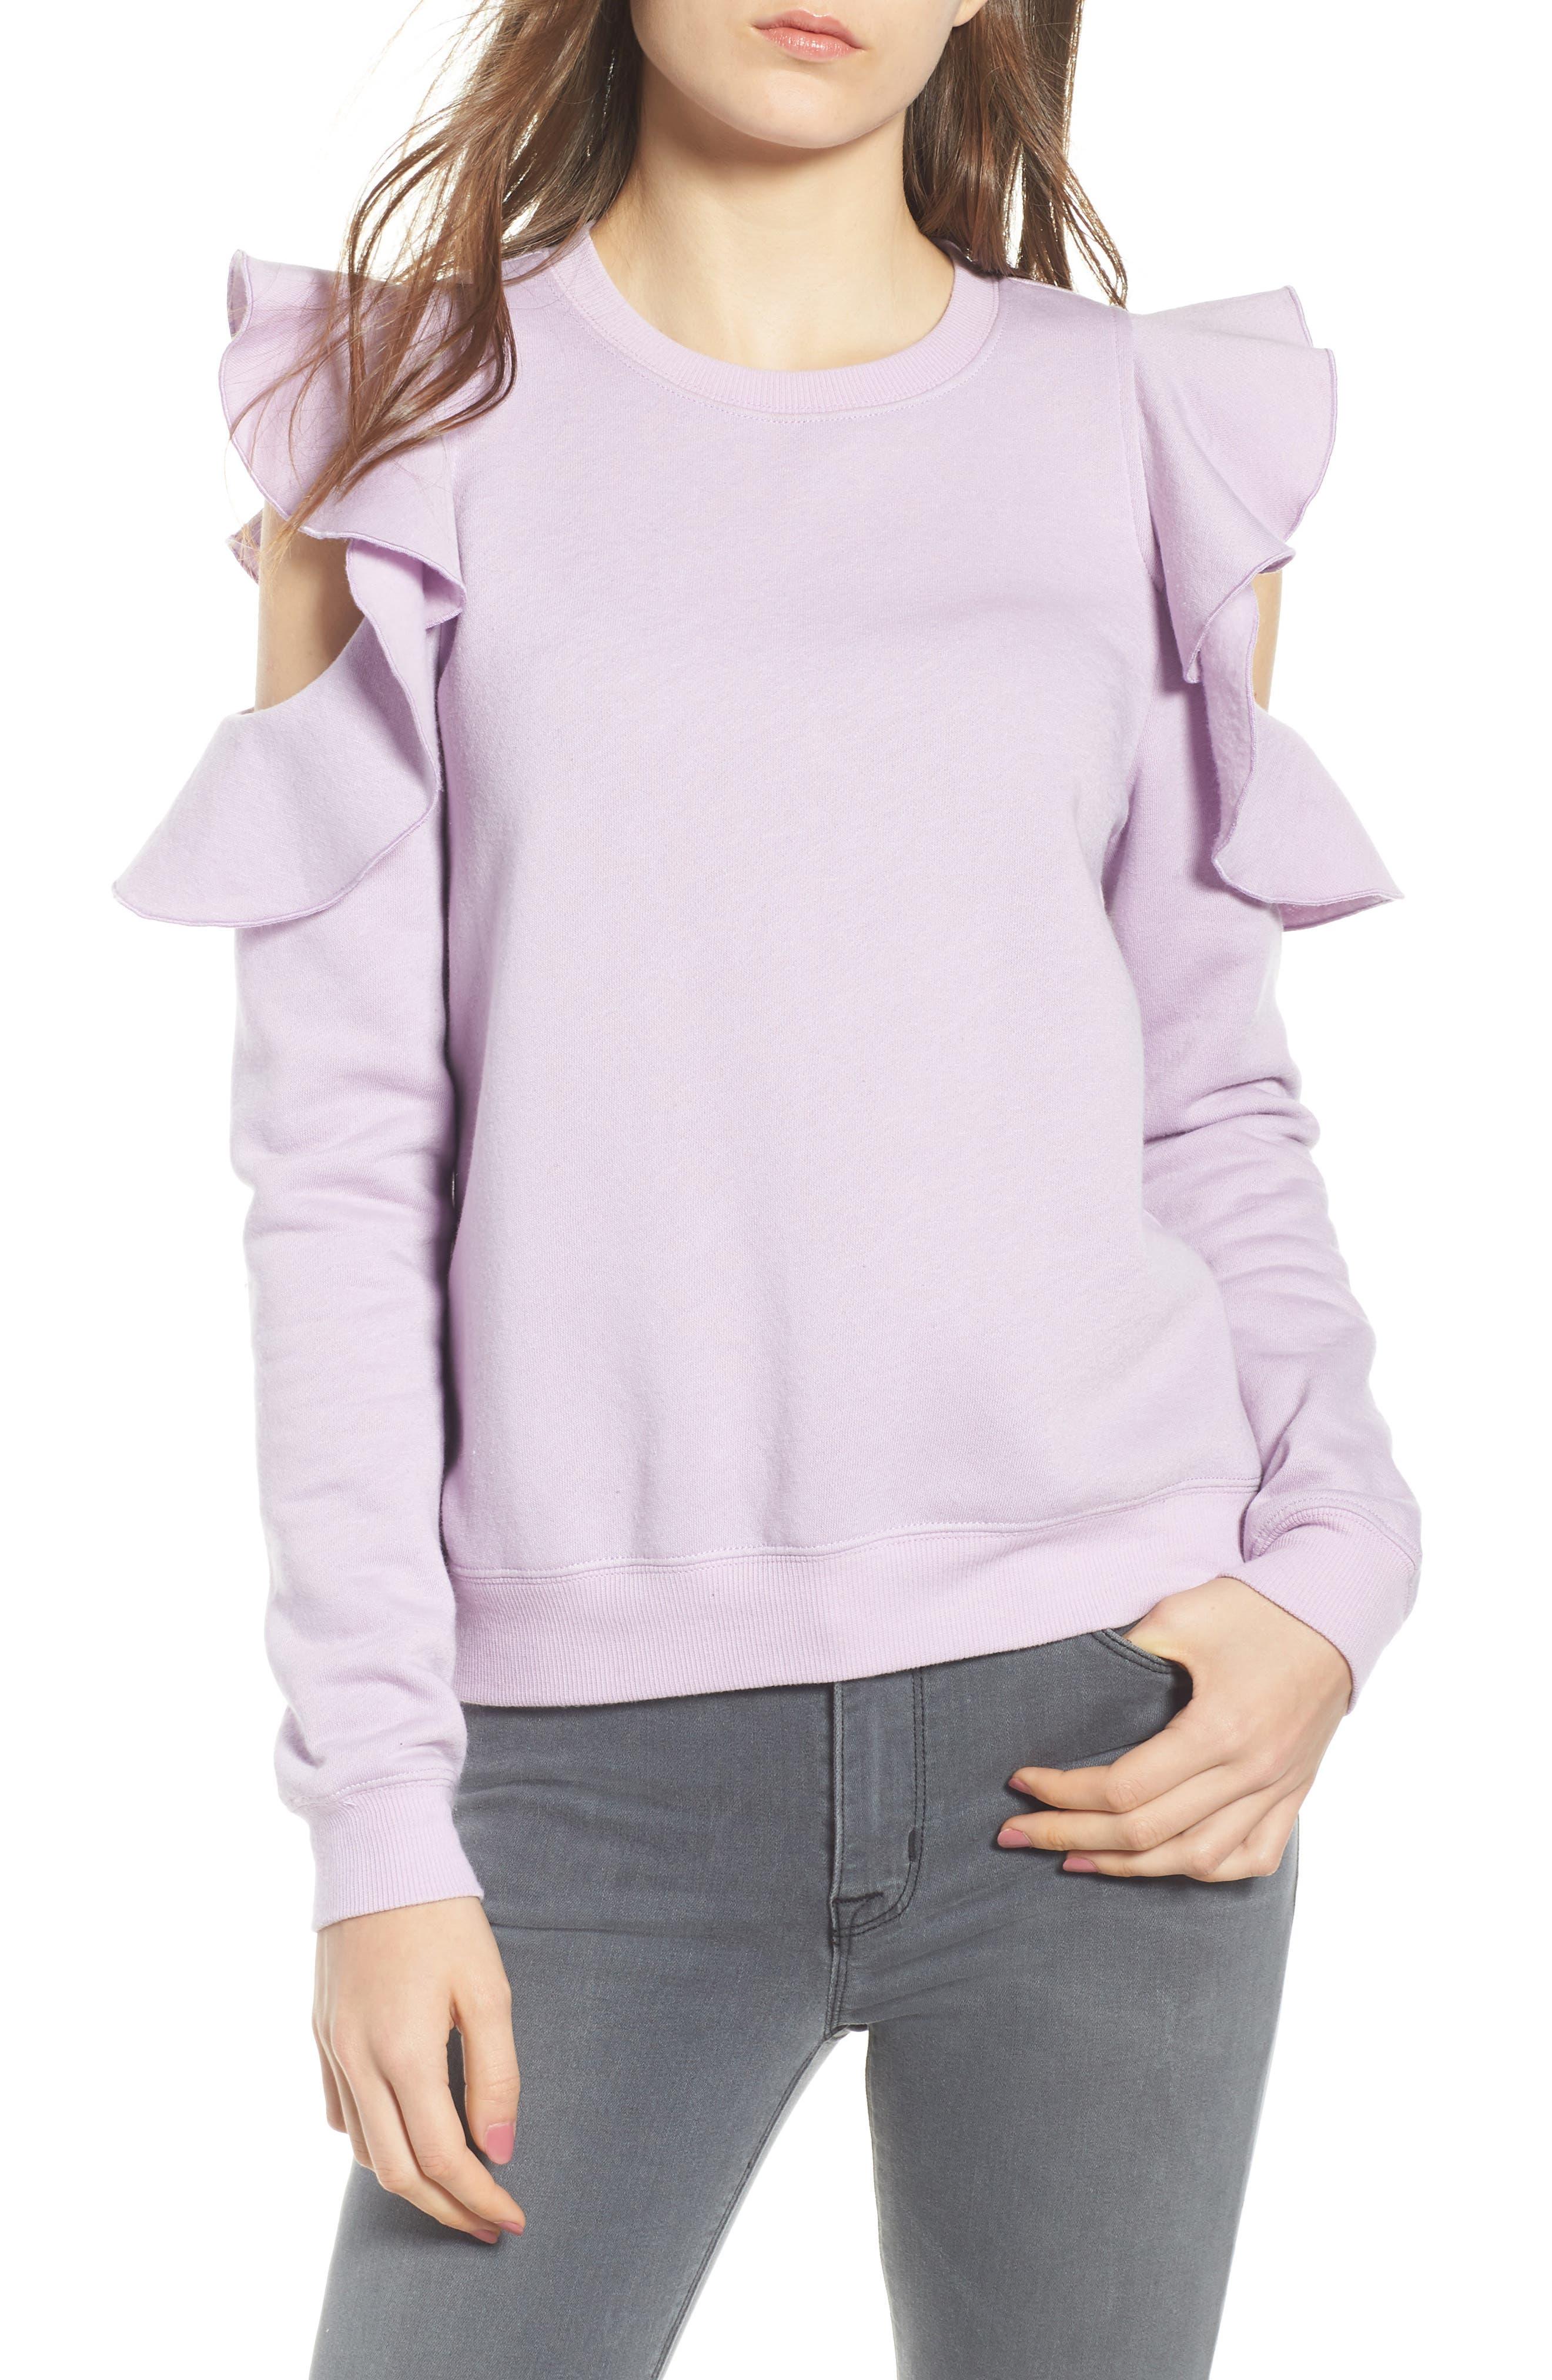 REBECCA MINKOFF Gracie Cold Shoulder Sweatshirt, Main, color, 502